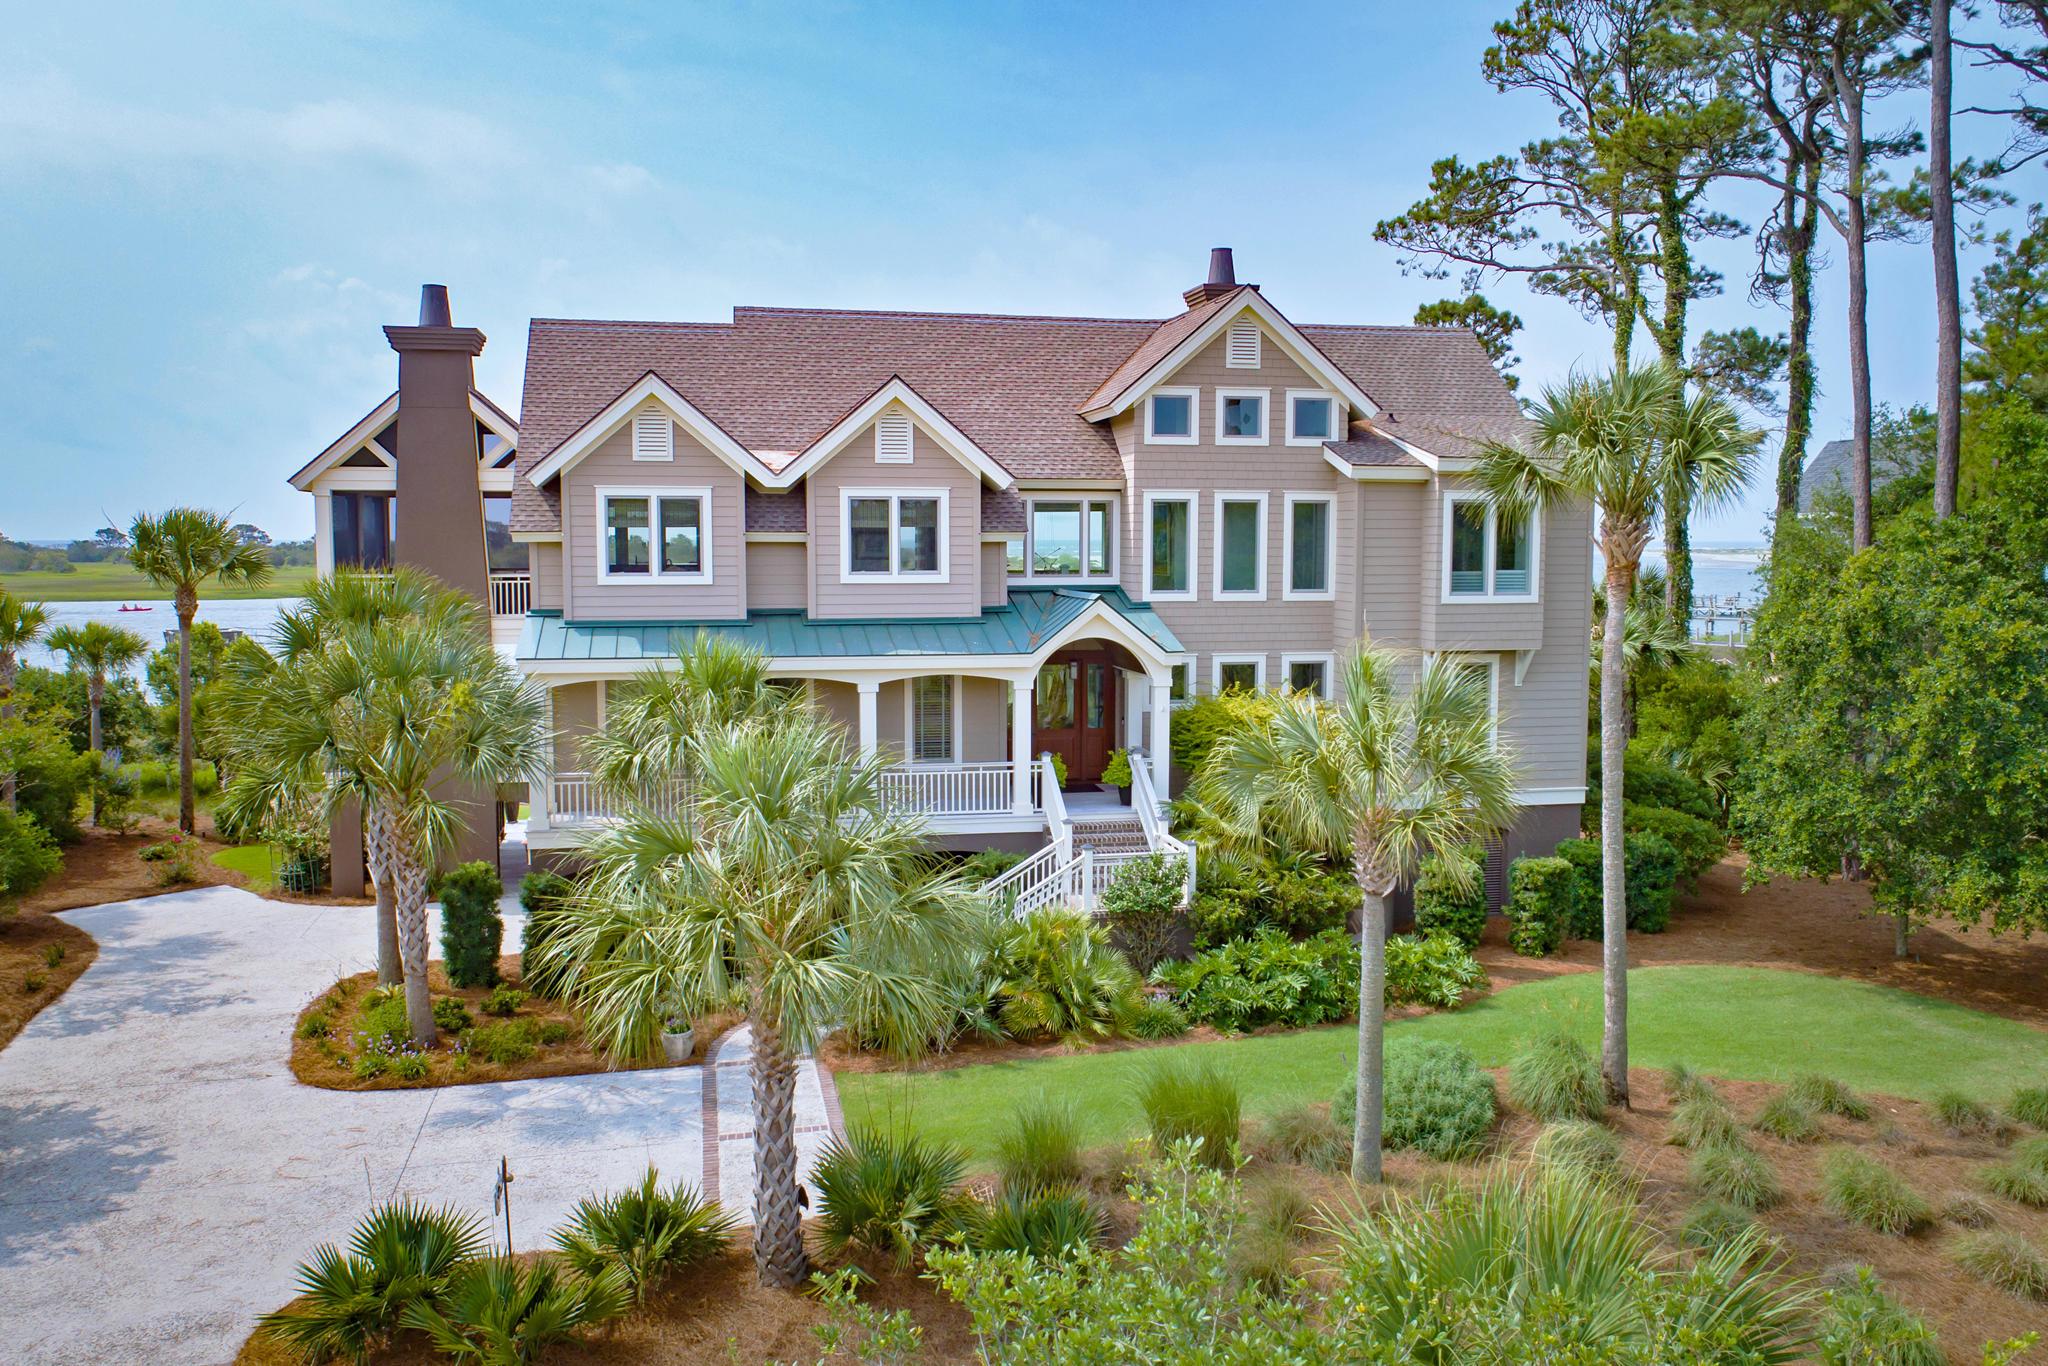 Seabrook Island Homes For Sale - 3135 Marshgate, Seabrook Island, SC - 6